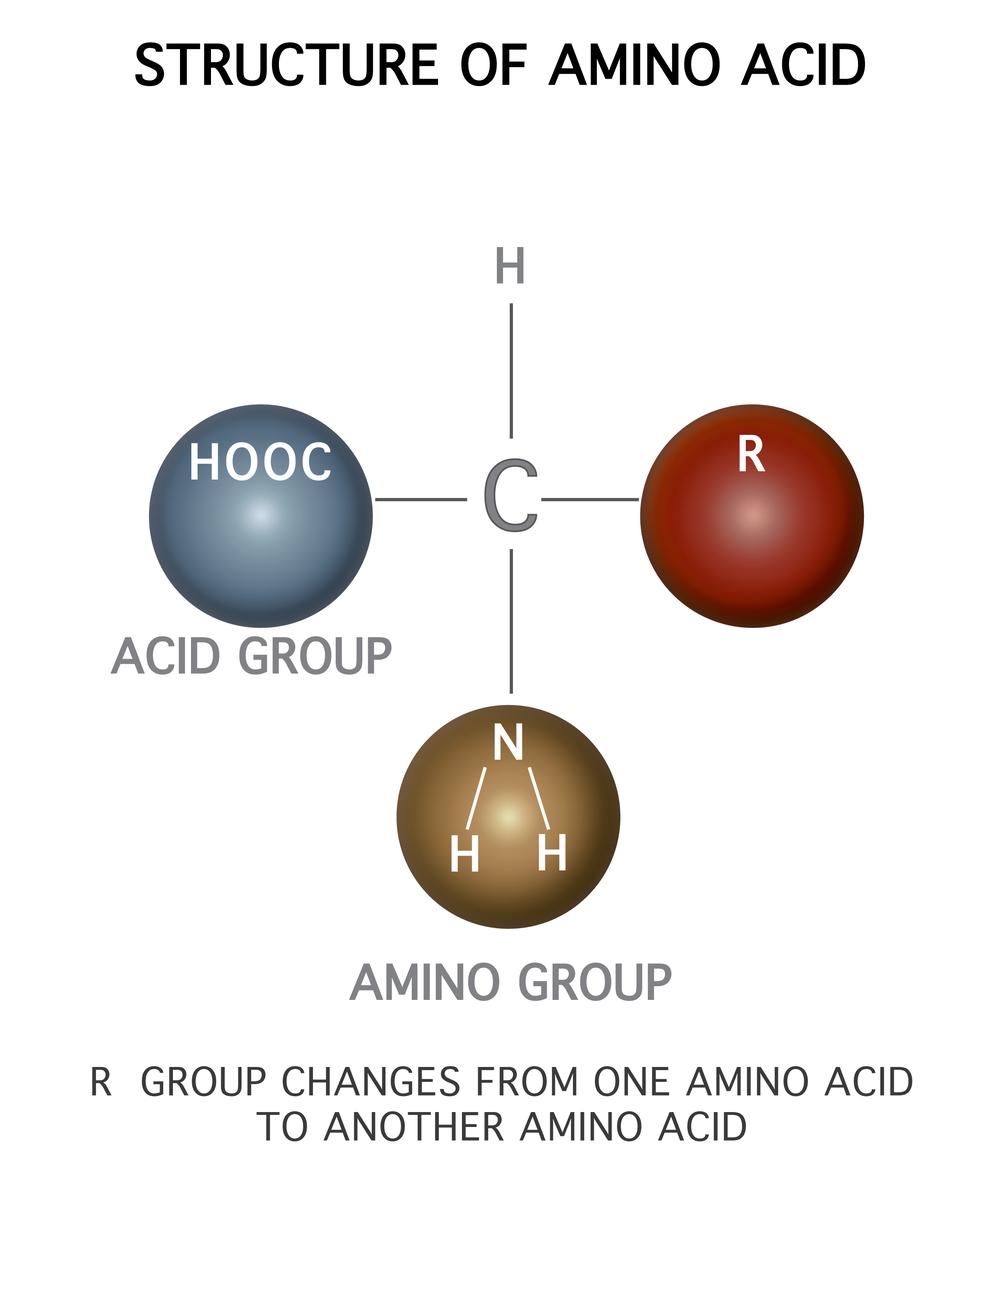 Structure of amino acid